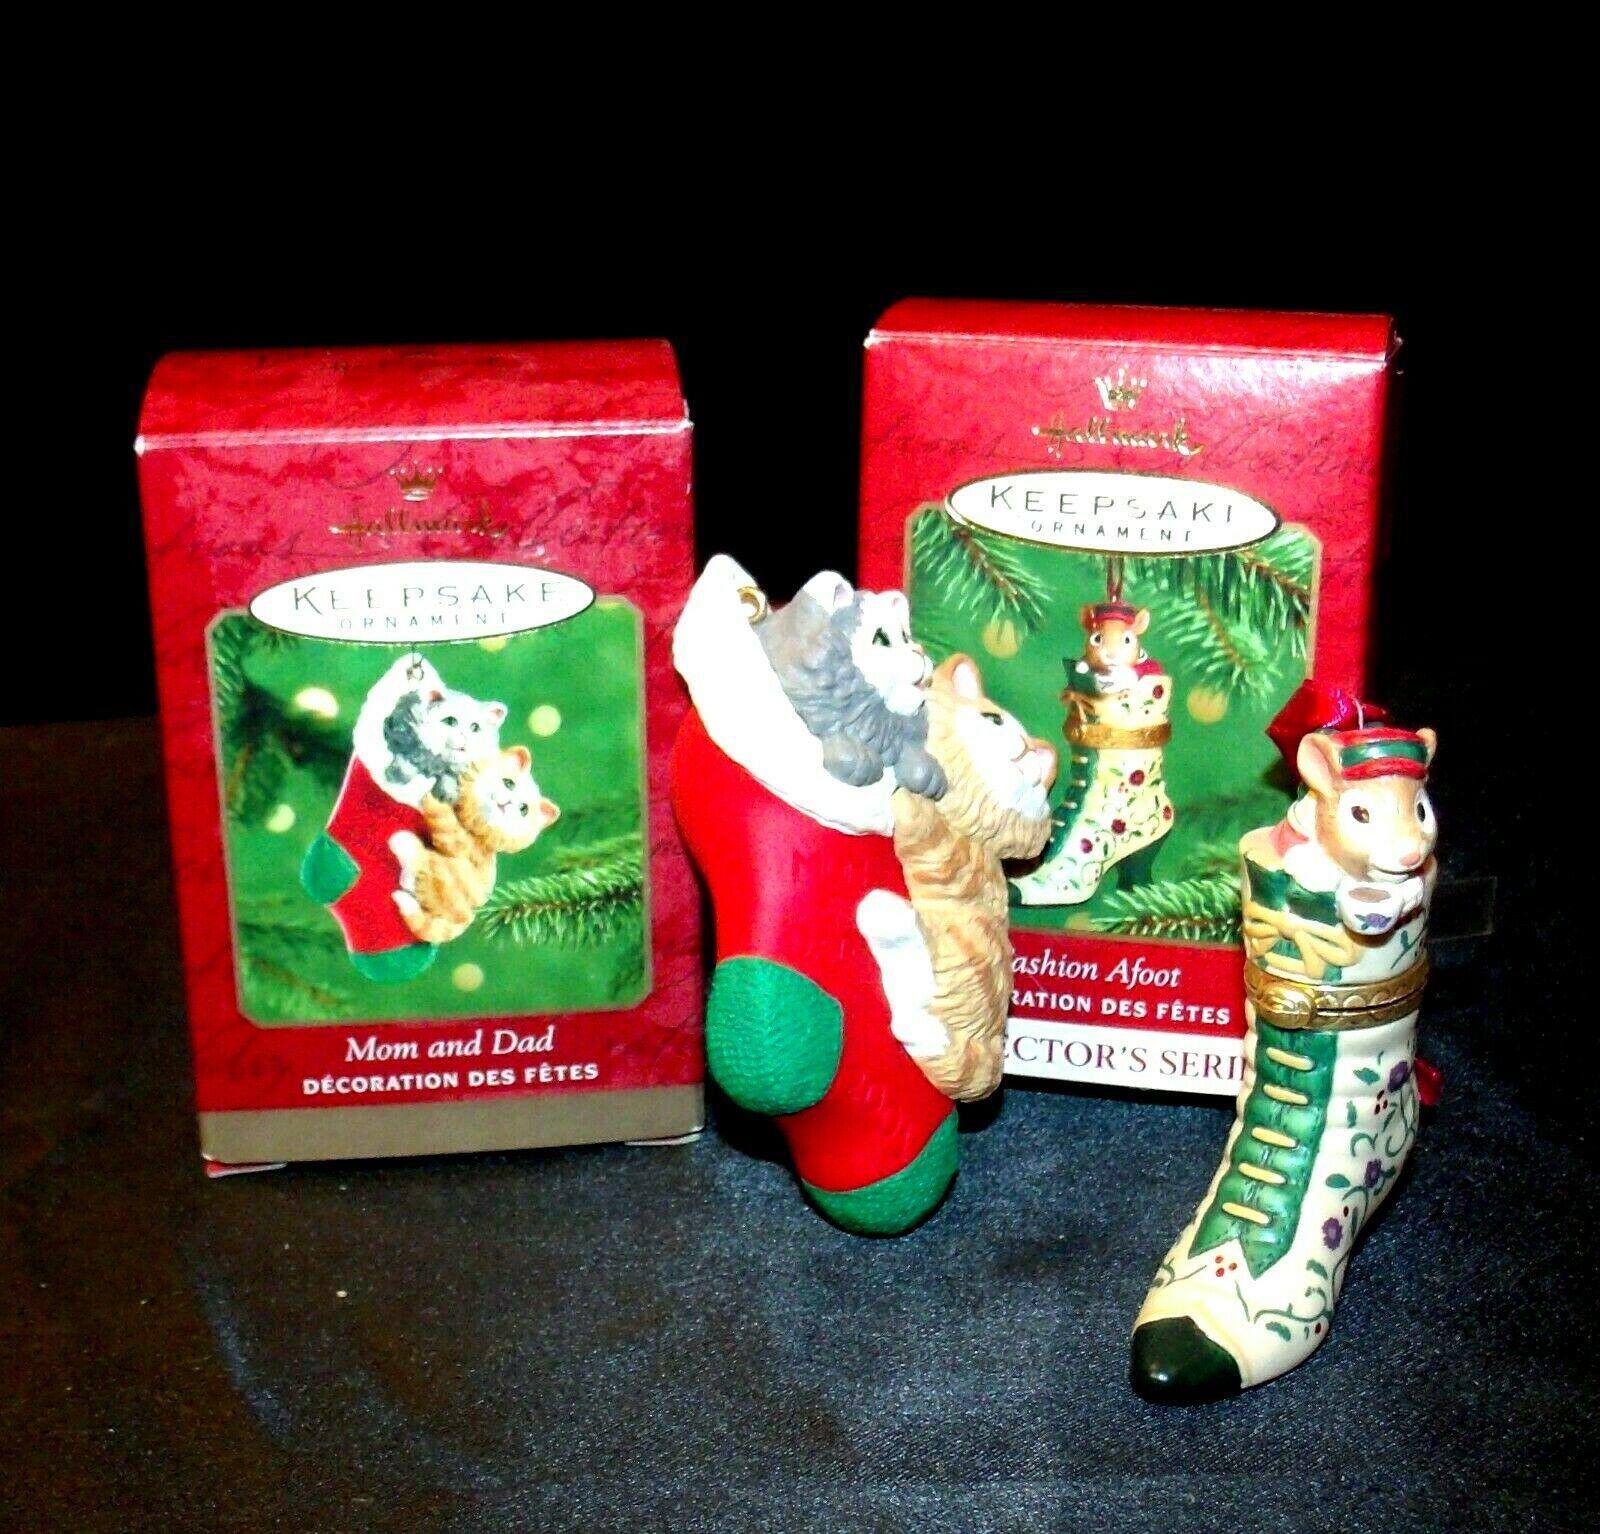 Hallmark Keepsake Ornaments Fashion Afoot & Mom & Dad Stocking AA-191792E Colle